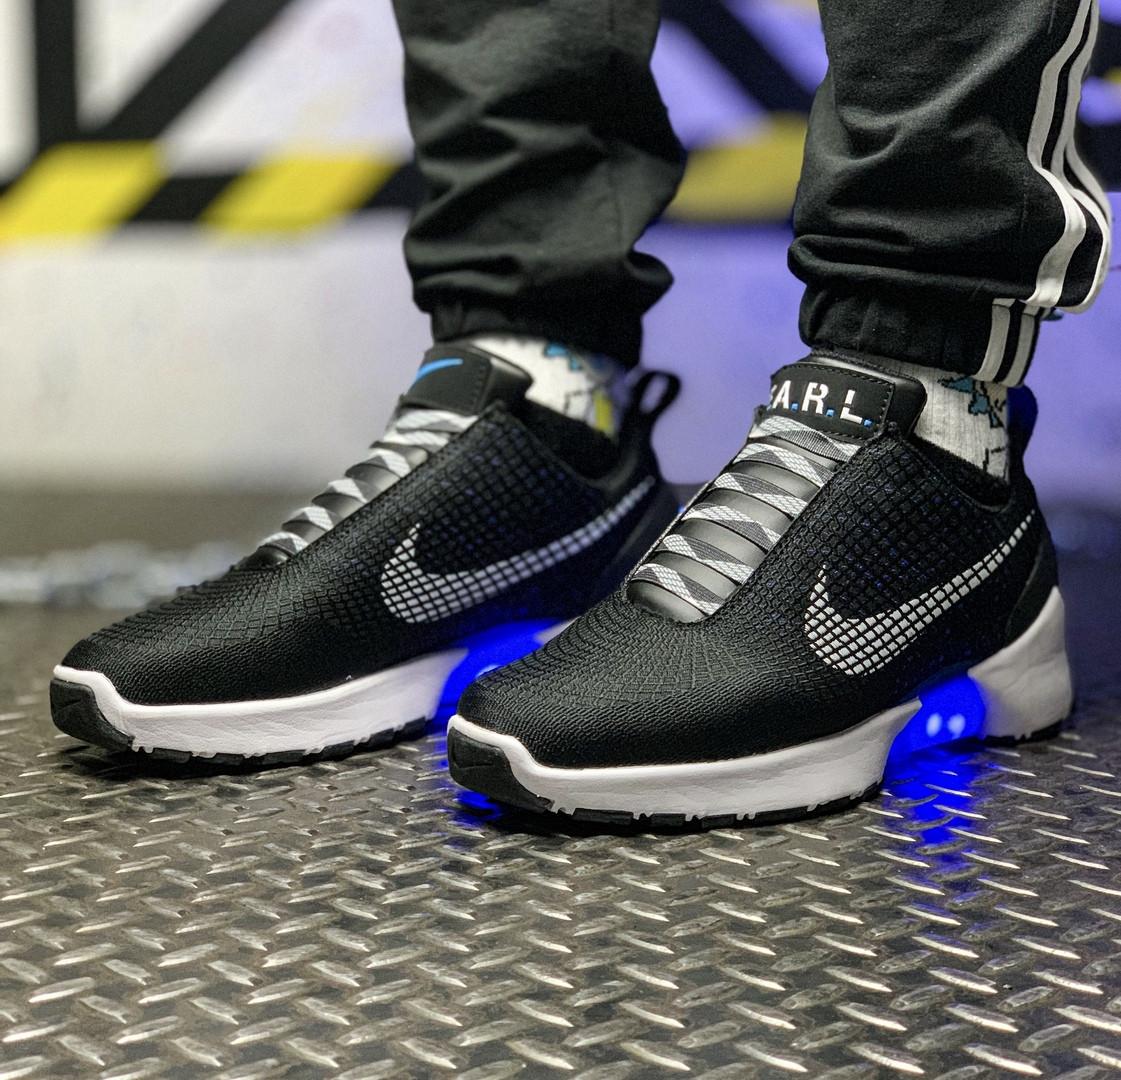 Nike HyperAdapt E.A.R.L. MT2 Black